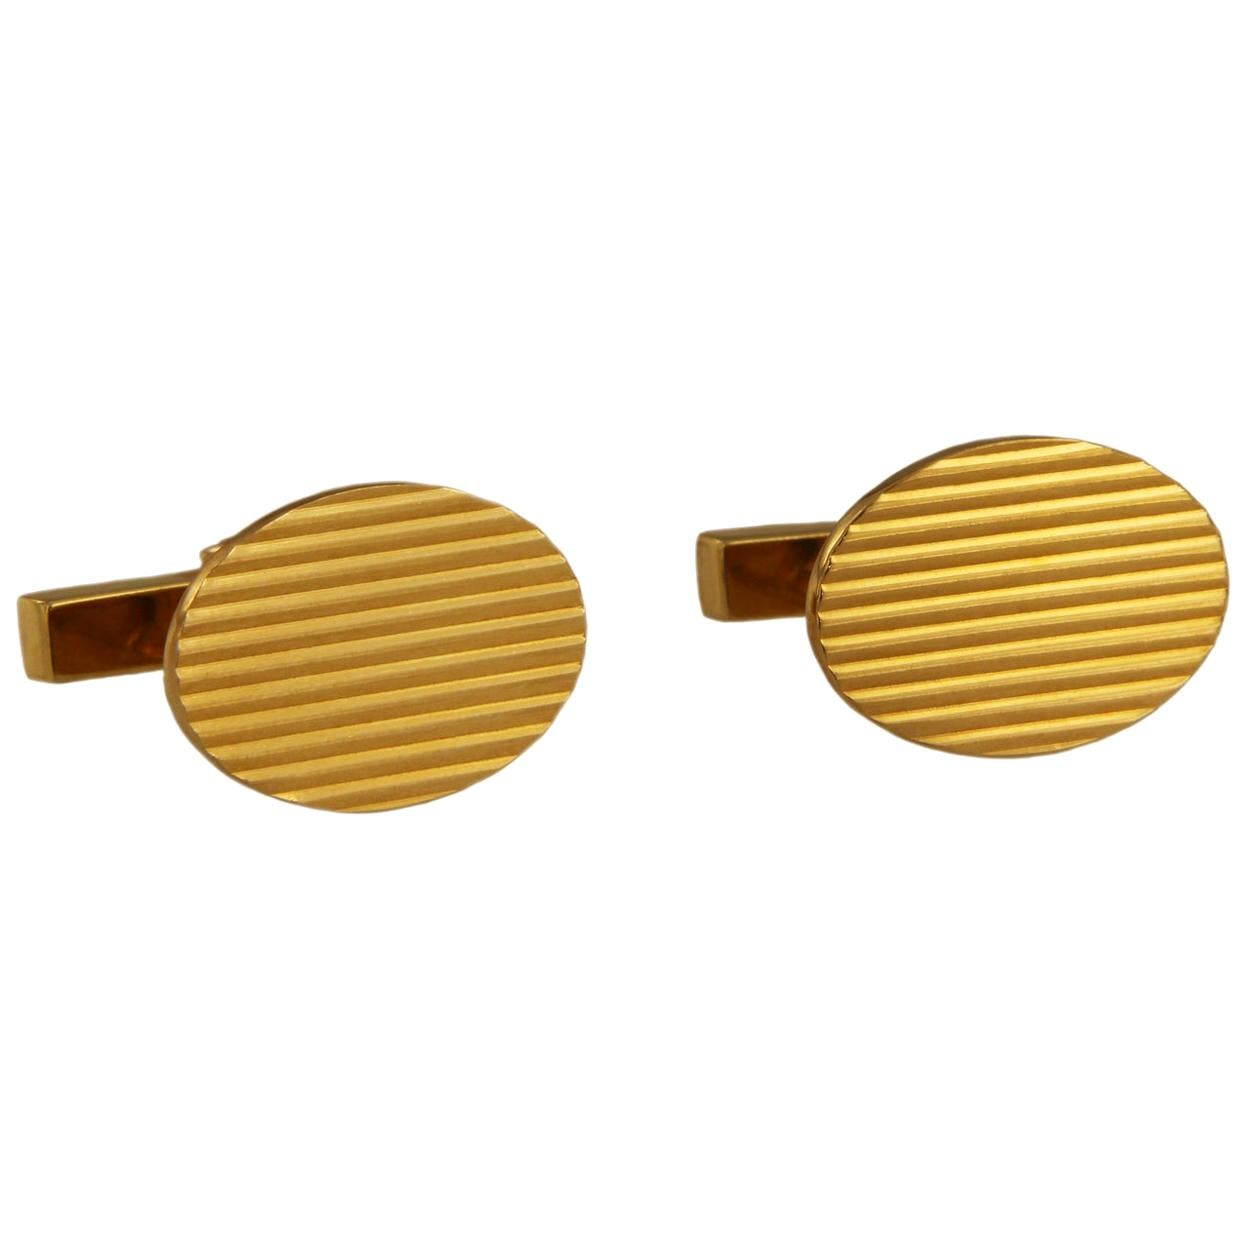 Tiffany & Co. 14 Karat Yellow Gold Men's Cufflinks